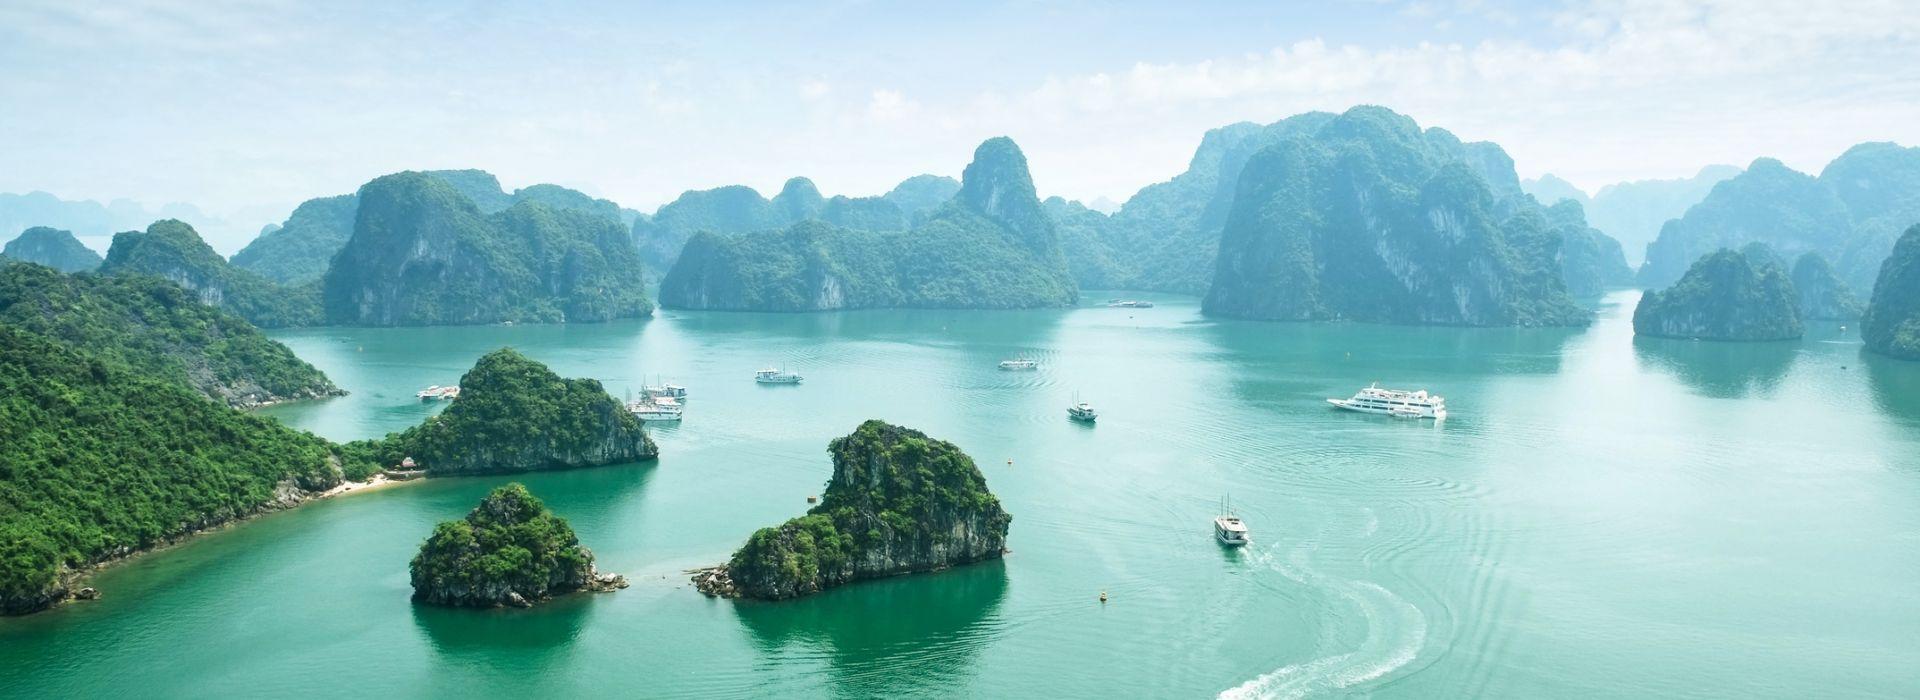 Cruise Tours in Hanoi